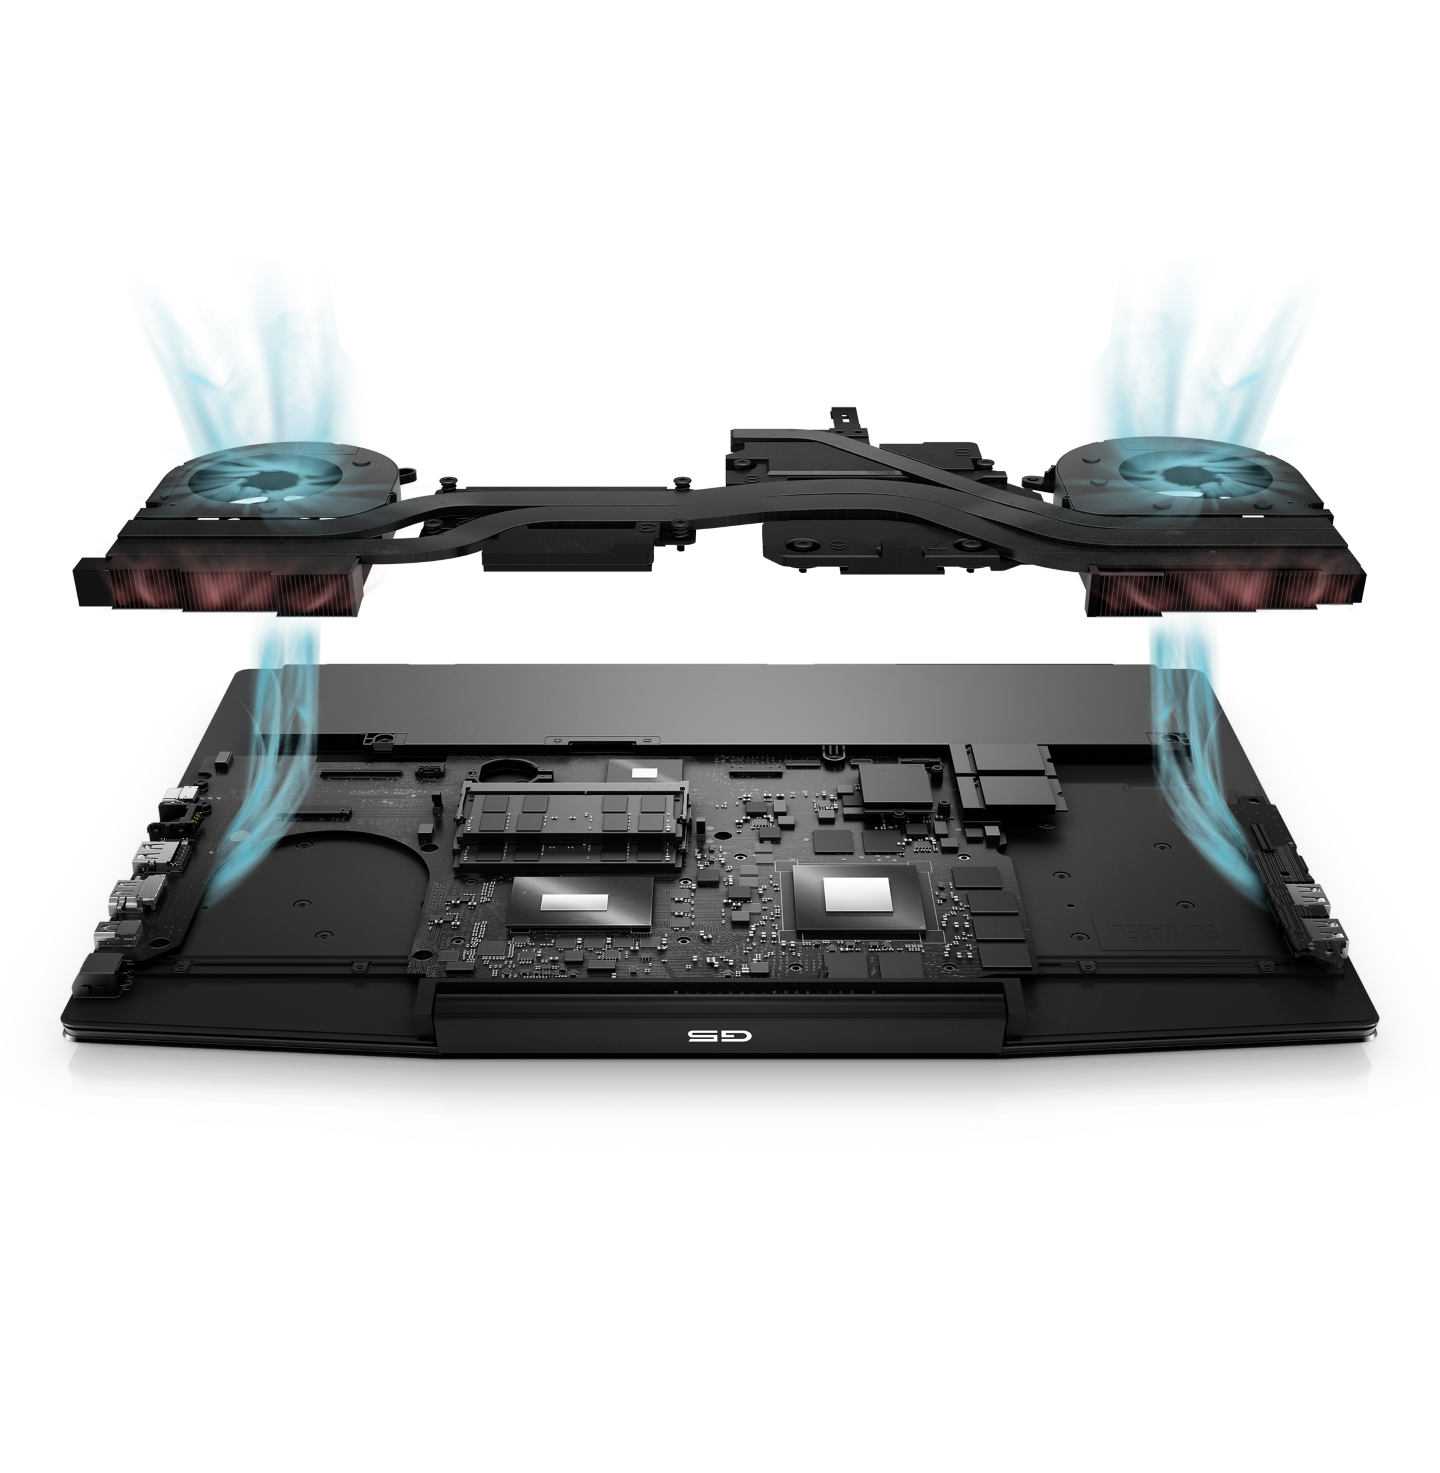 dell-g5-15-5500-thermals-custom